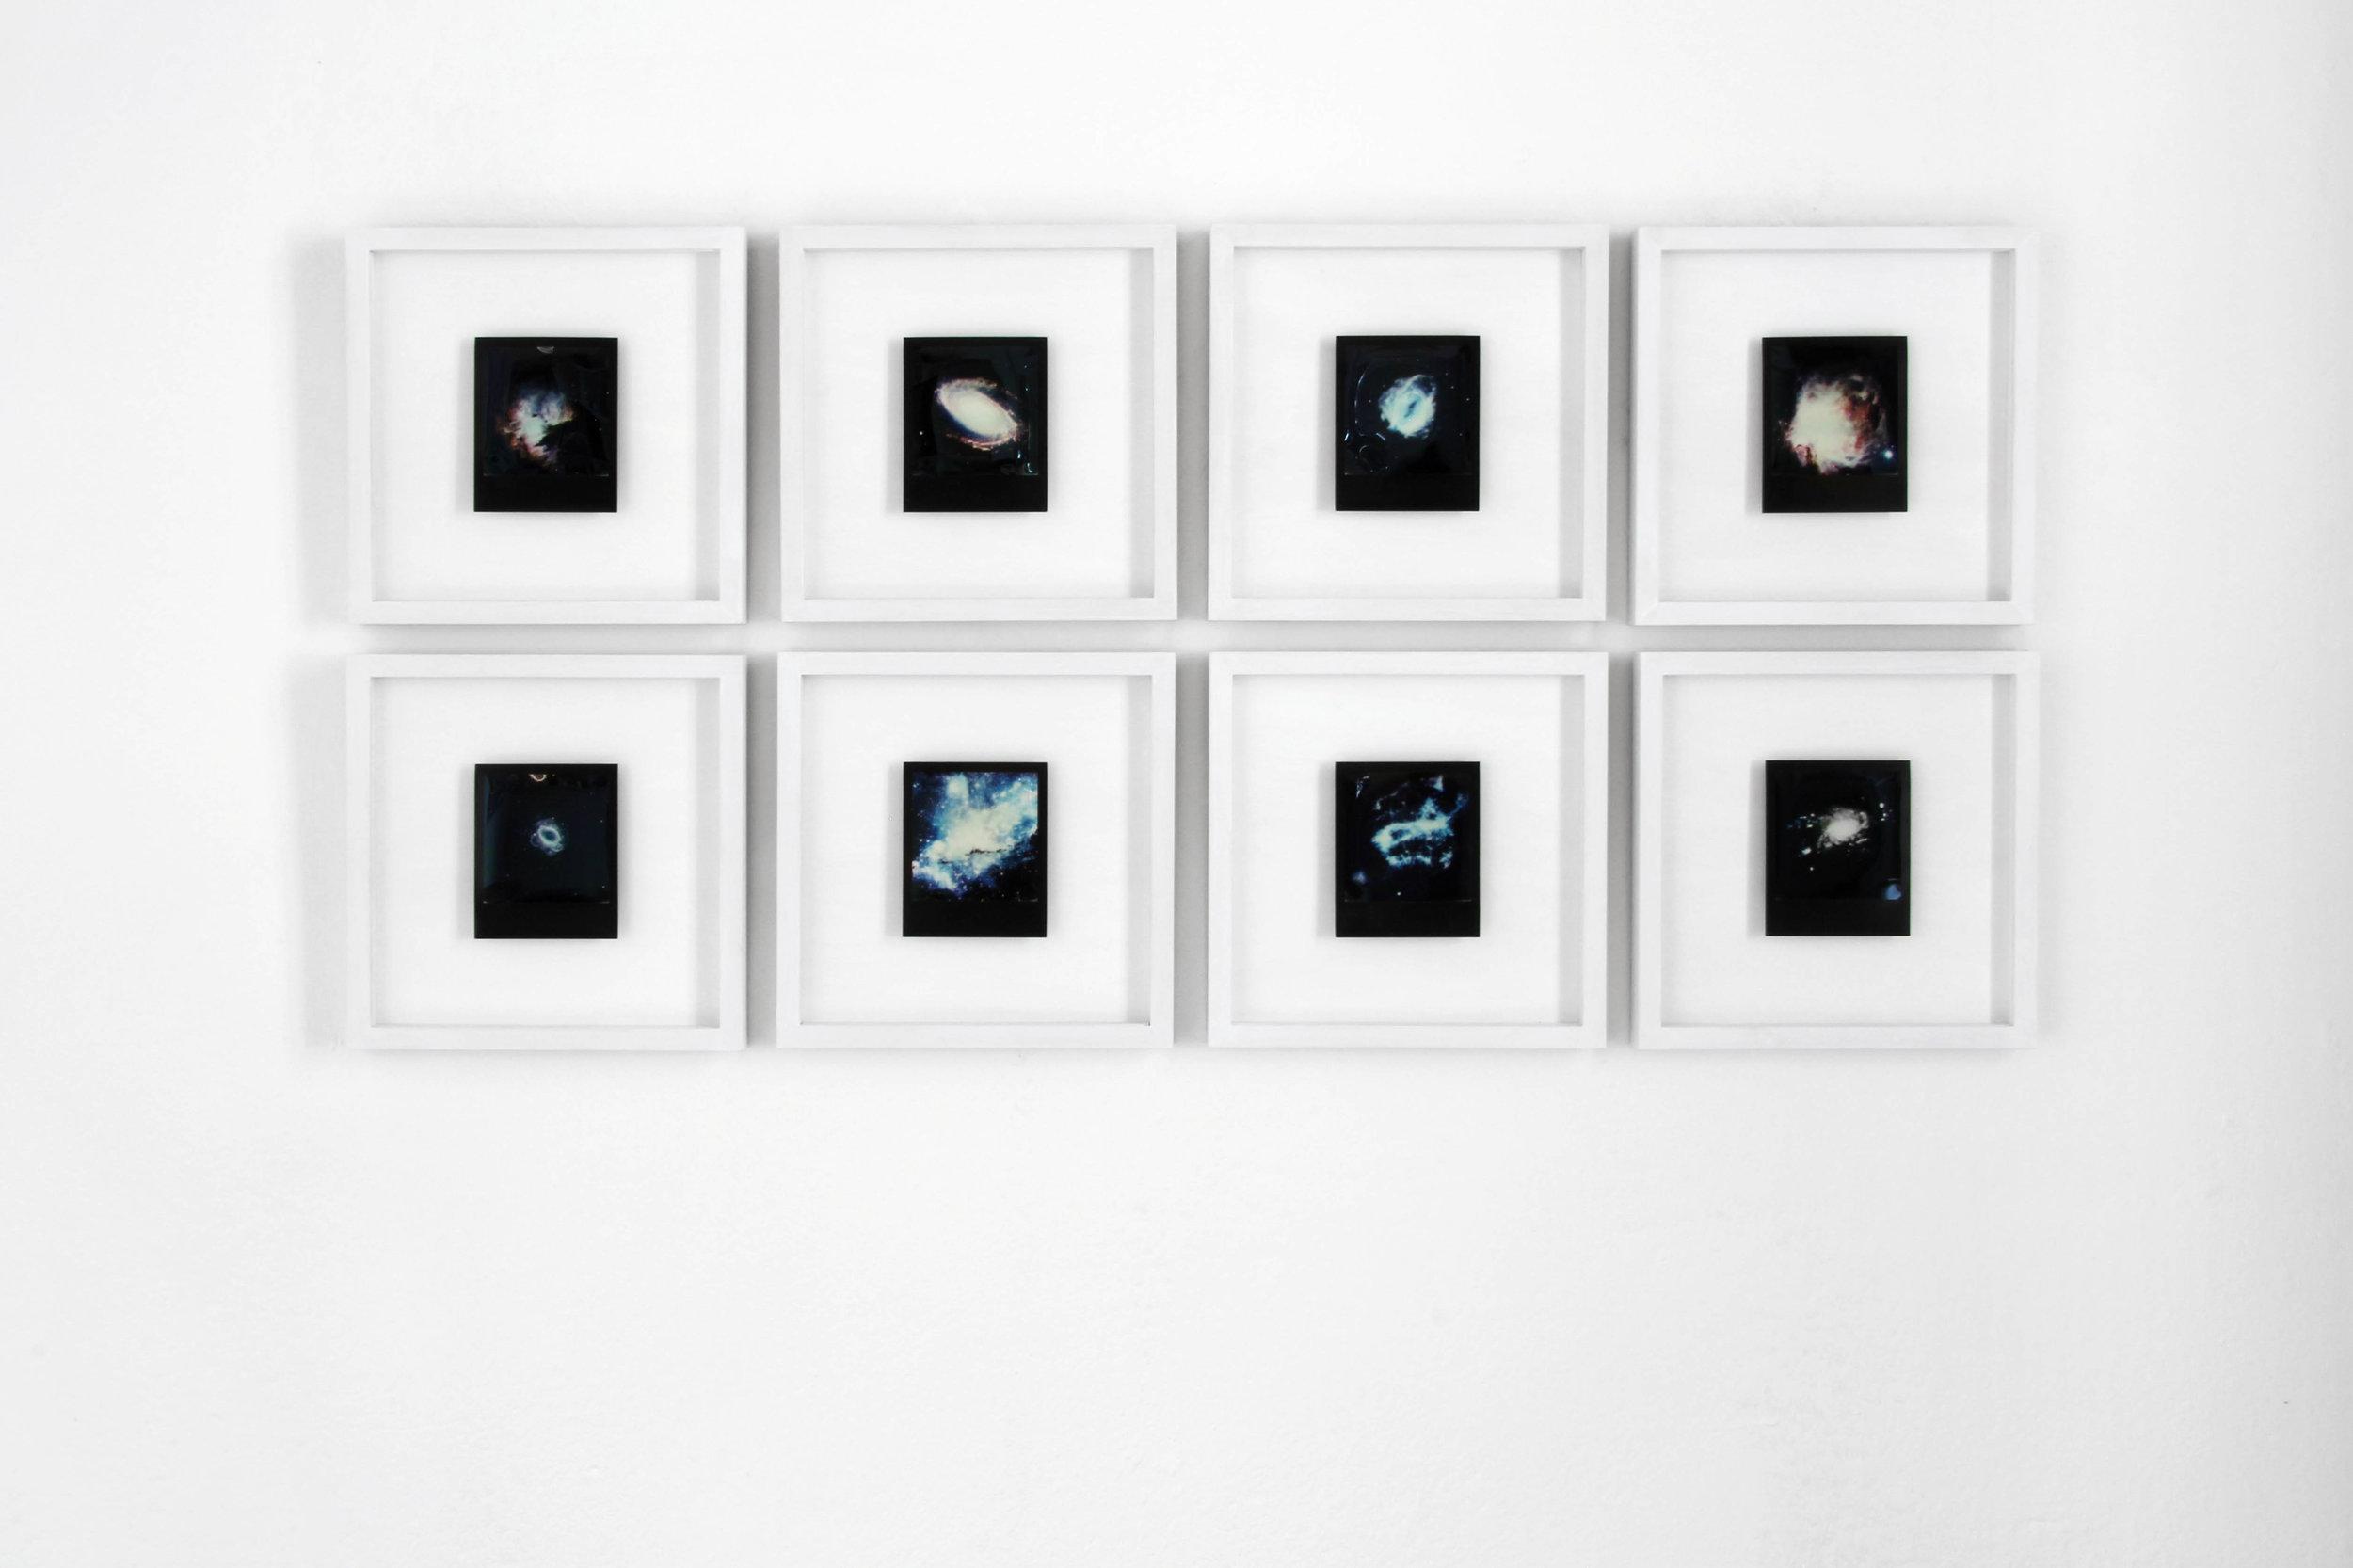 16 Irene-Fenara-Galactic-Adventure-Ltd.-2015-Polaroid-cm24x24.jpg